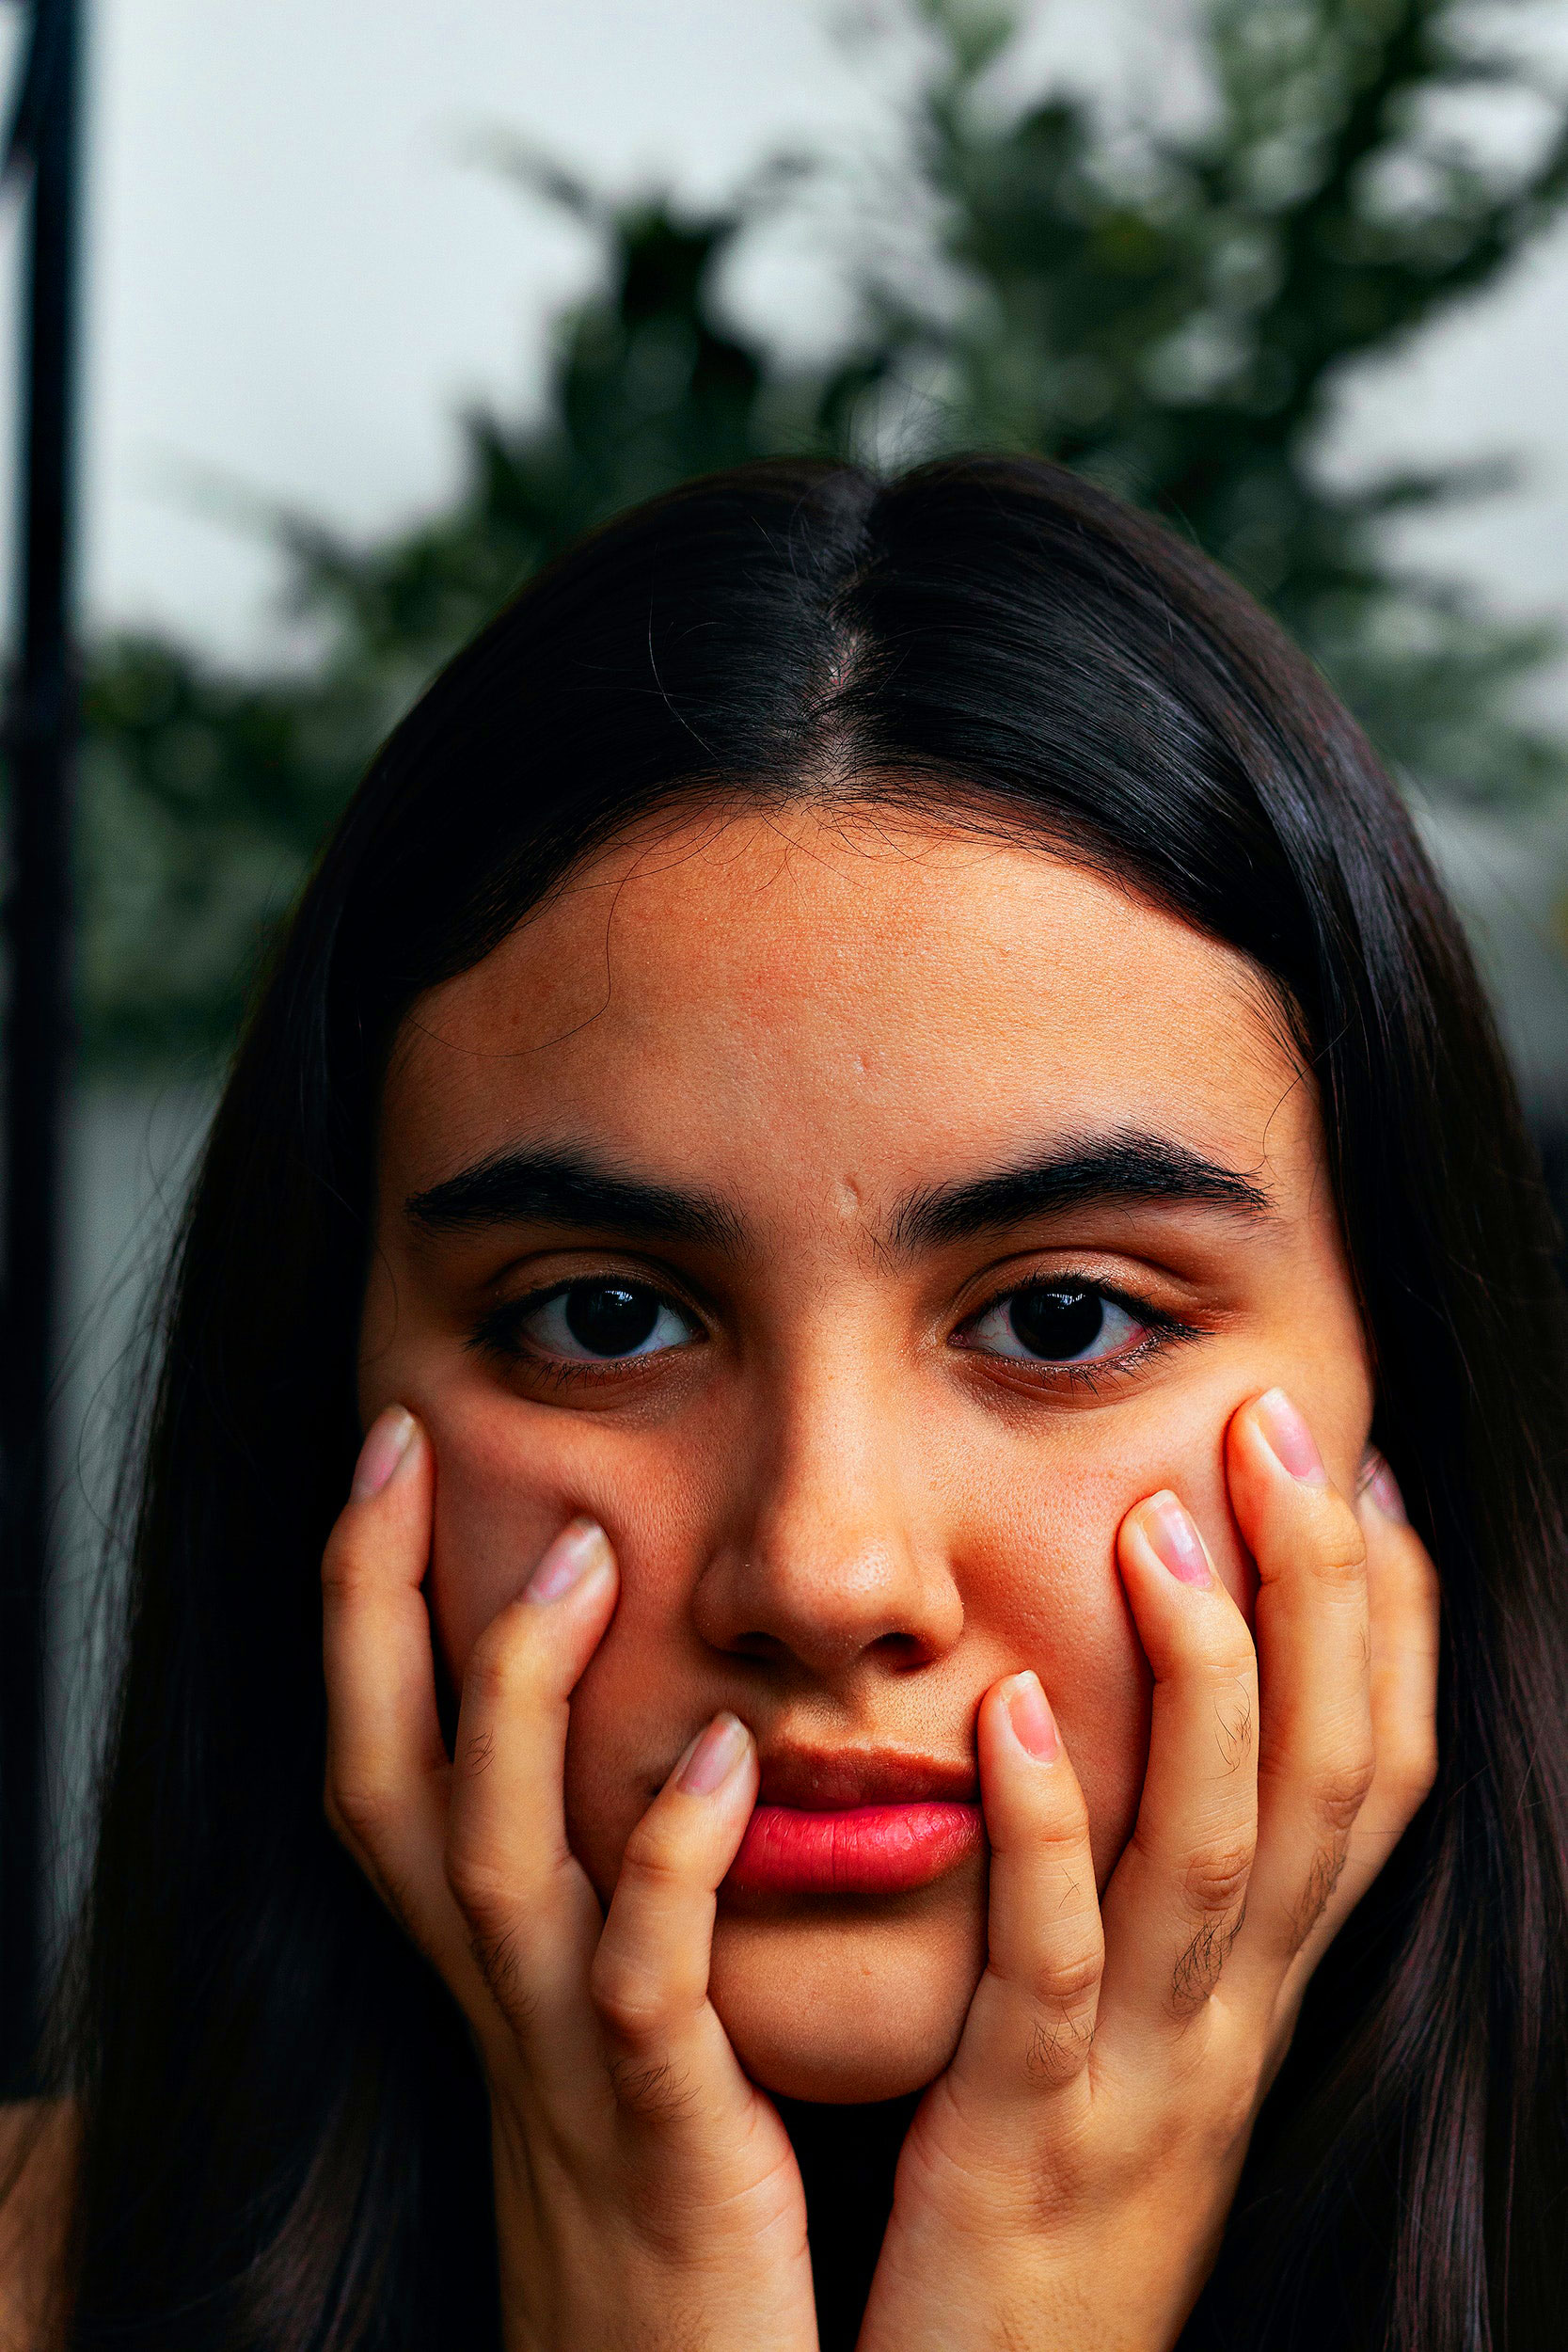 2021 New Sad Girl Whatsapp Dp Images pics download